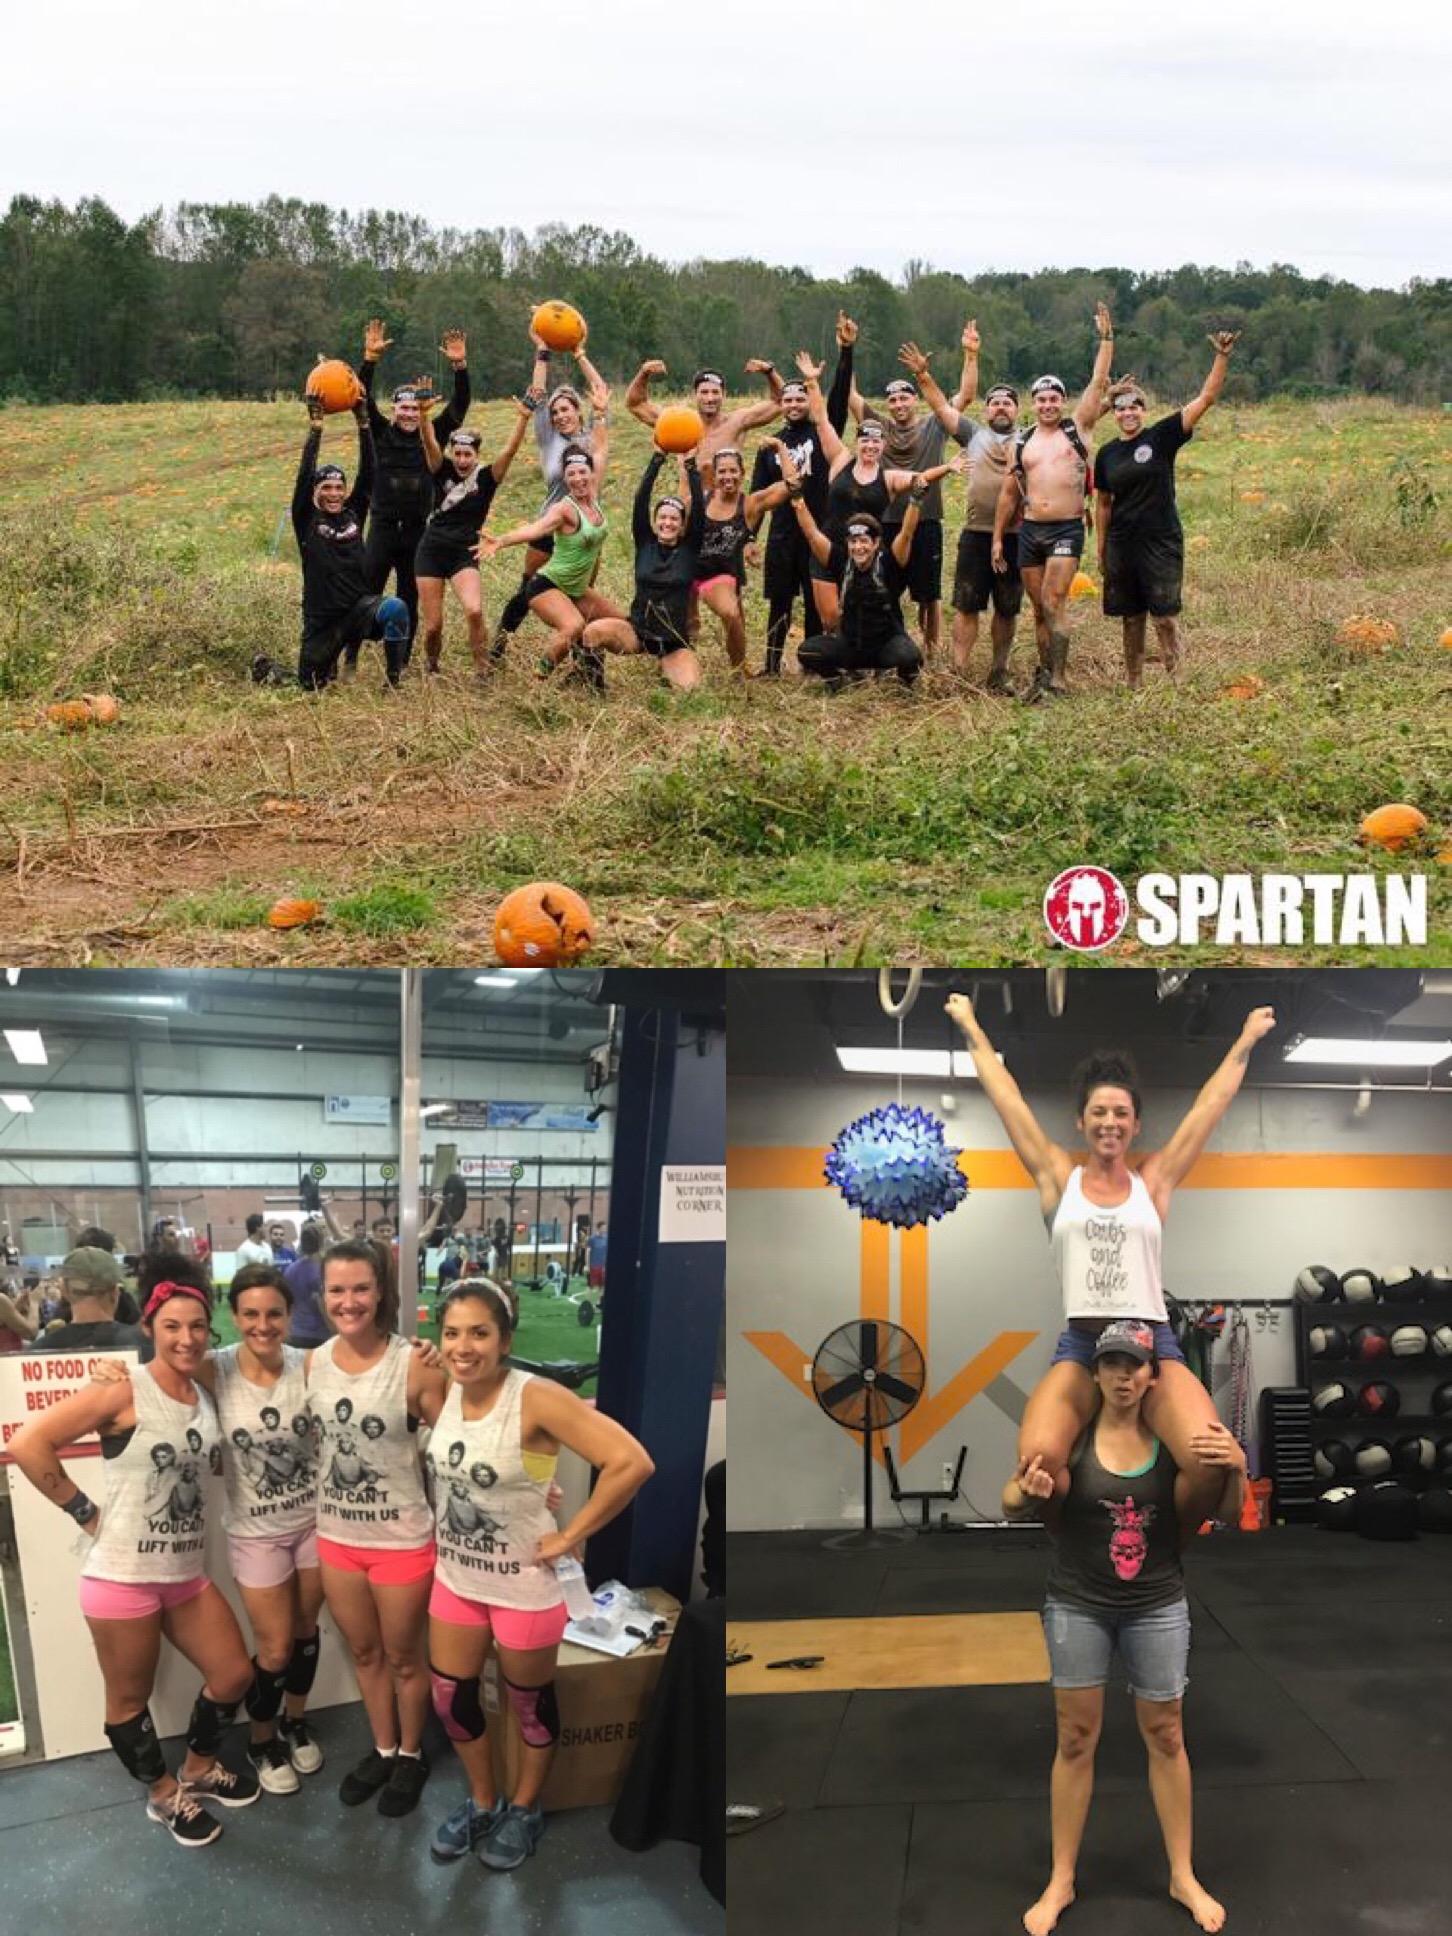 Spartan super 2018,, w/ DBCF co-owner and frIEND, ANNA CHEVALIER, Gangs of the mid-atlantic 2017 (kelly, stephanie, anna)